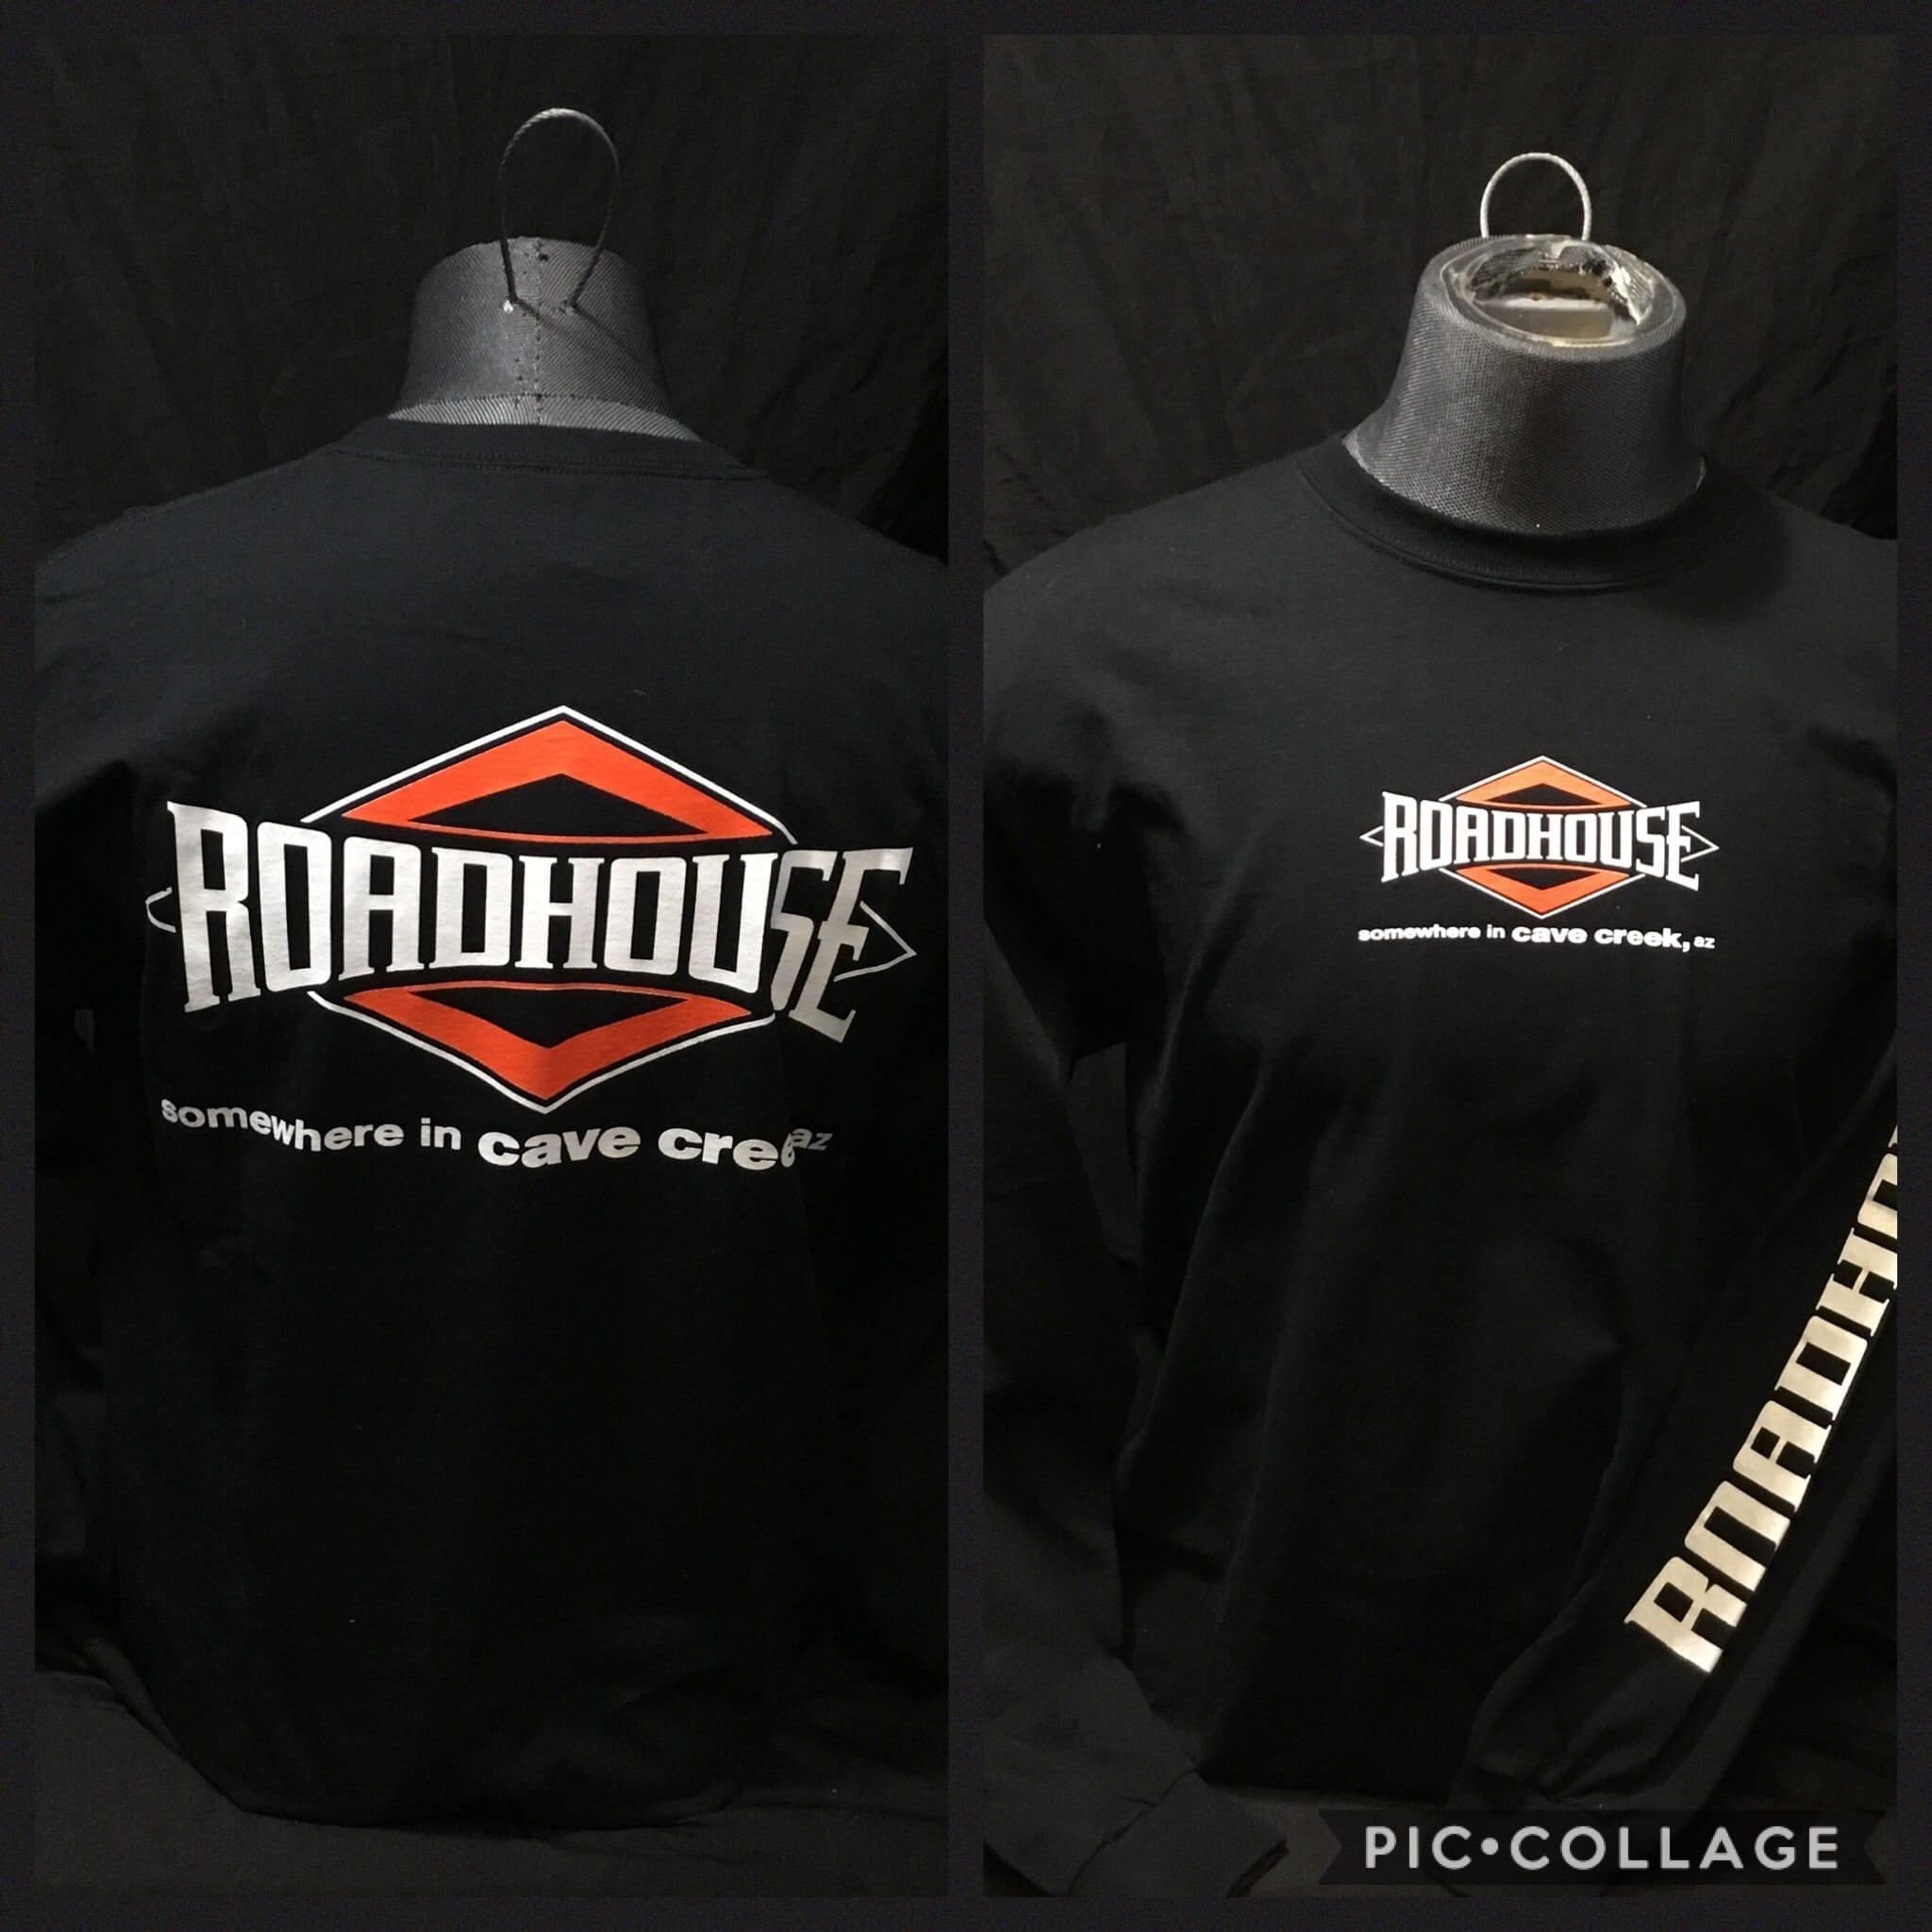 Roadhouse: Men's Long Sleeve Diamond Shirt - Black